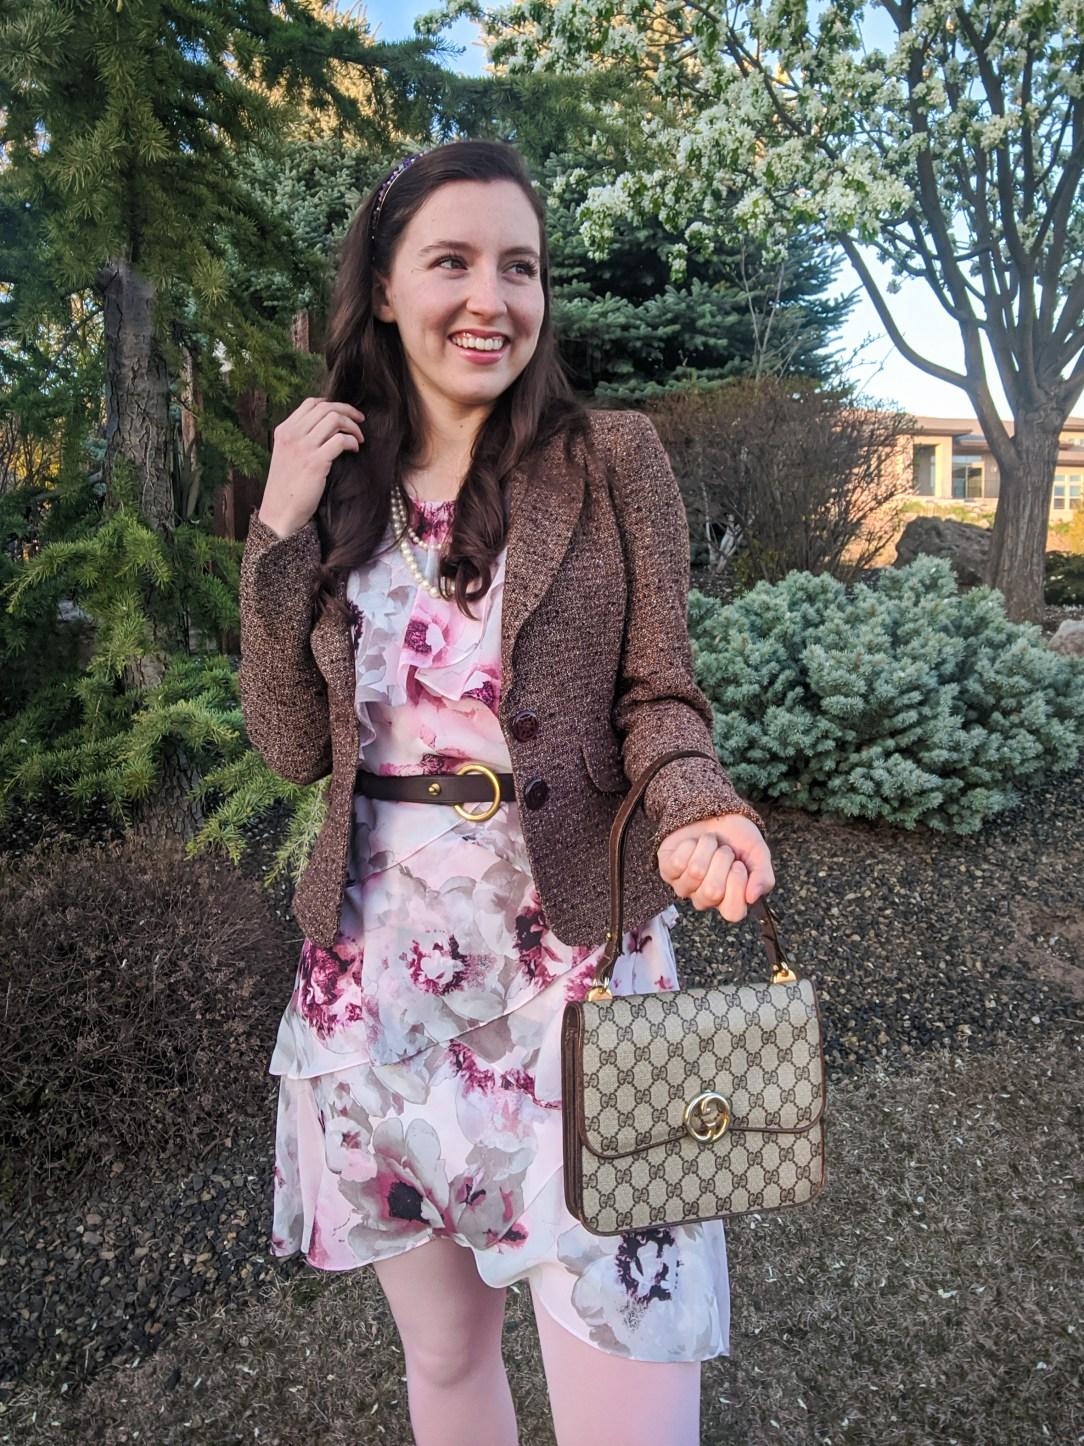 gossip girl style, gossip girl series, pink floral dress